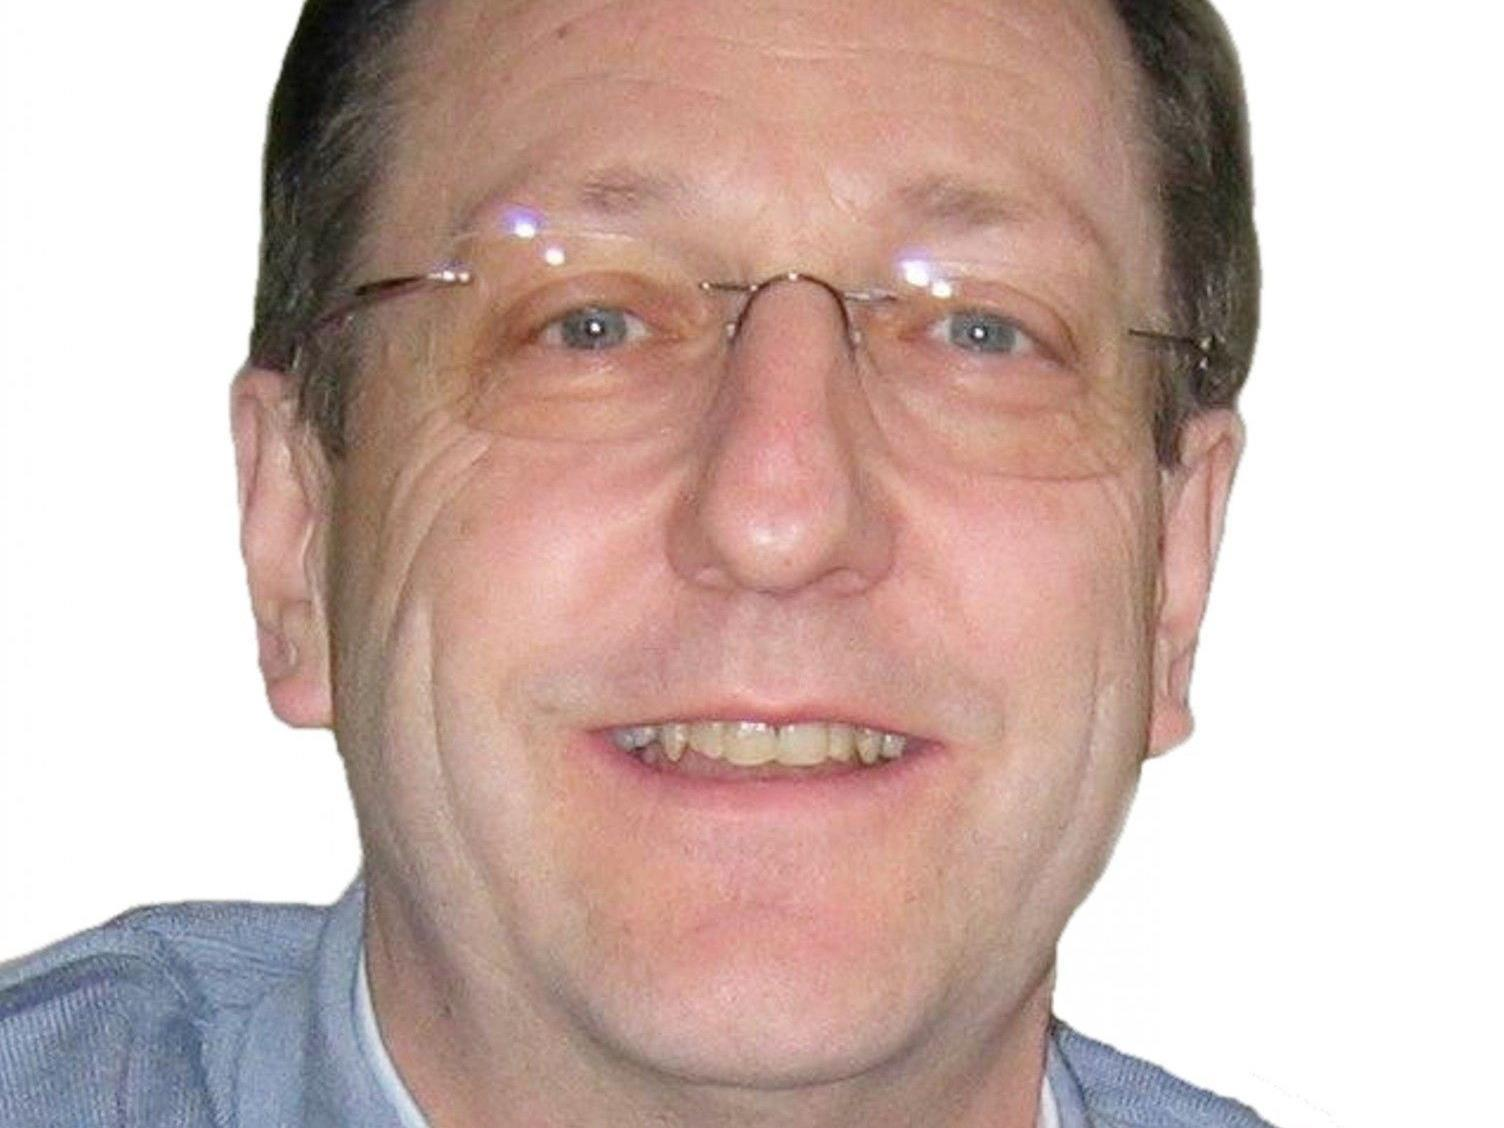 Pfarrer Wilfried Blum